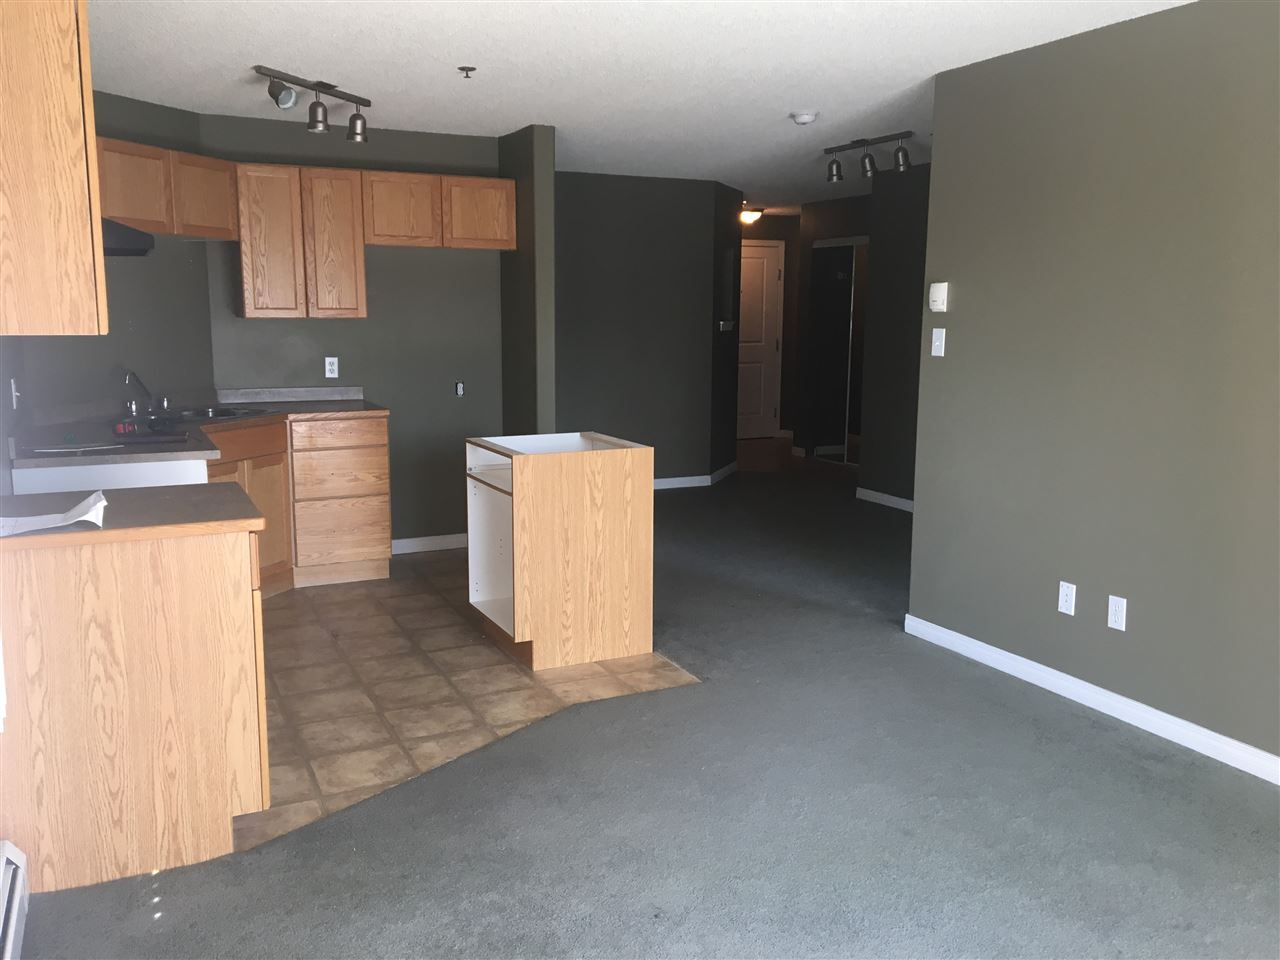 For Sale: 214 - 2305 35a Avenue, Edmonton, AB | 2 Bed, 2 Bath Condo for $159,000. See 14 photos!